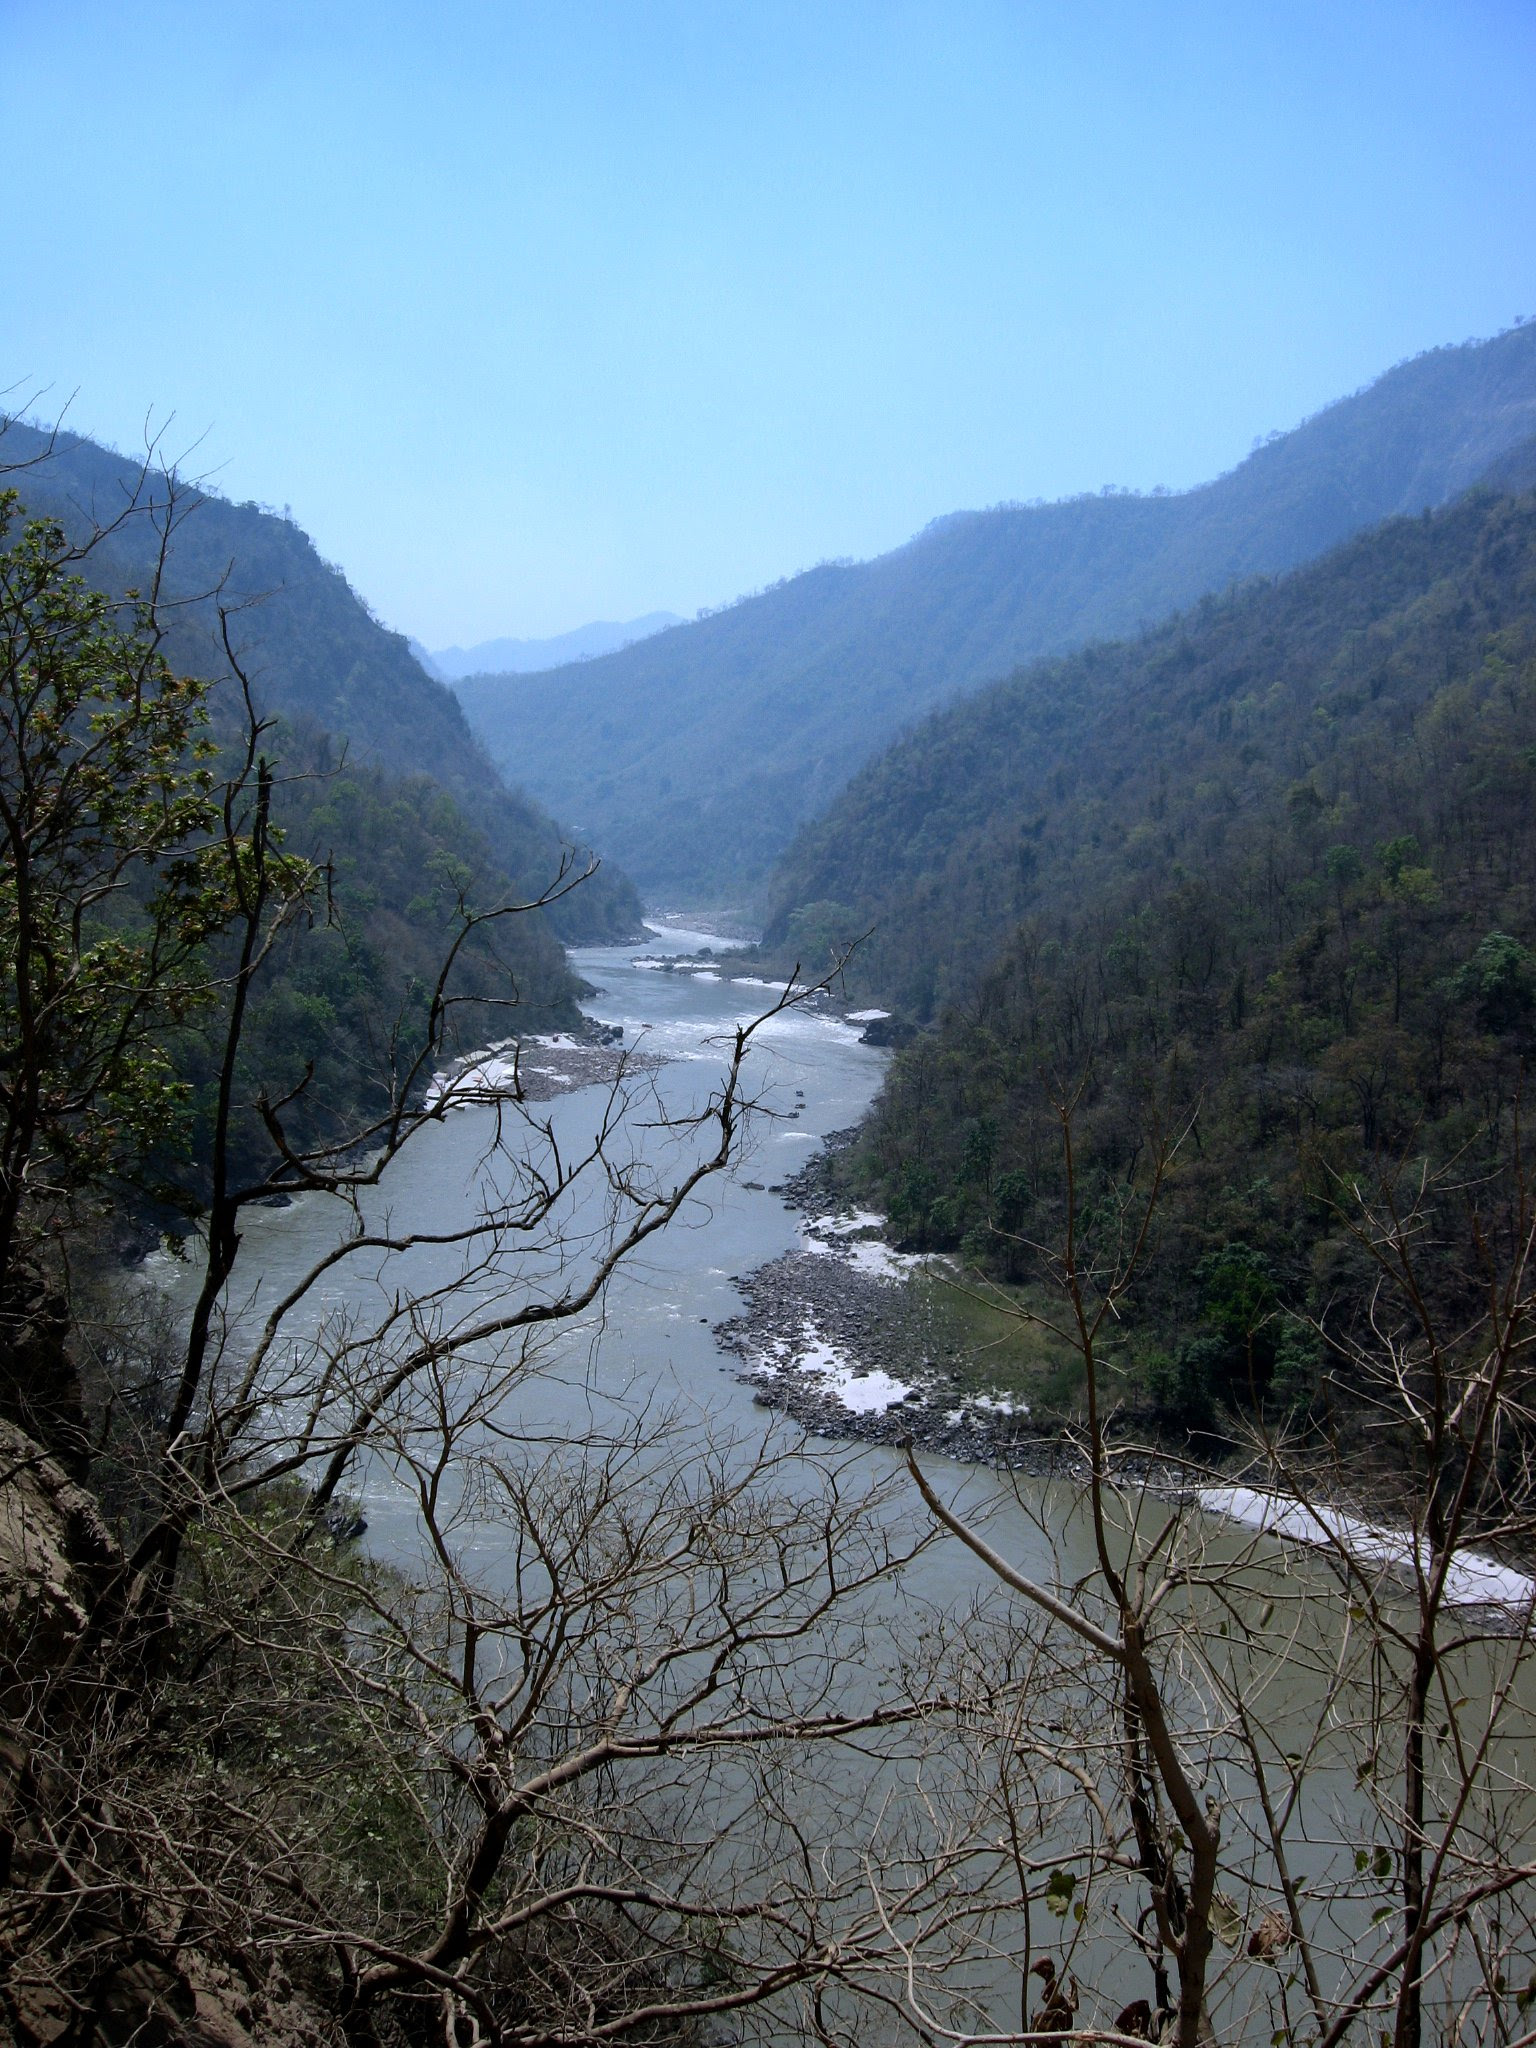 File:River Ganga meandering through the Shivalik ranges, Rishikesh.jpg